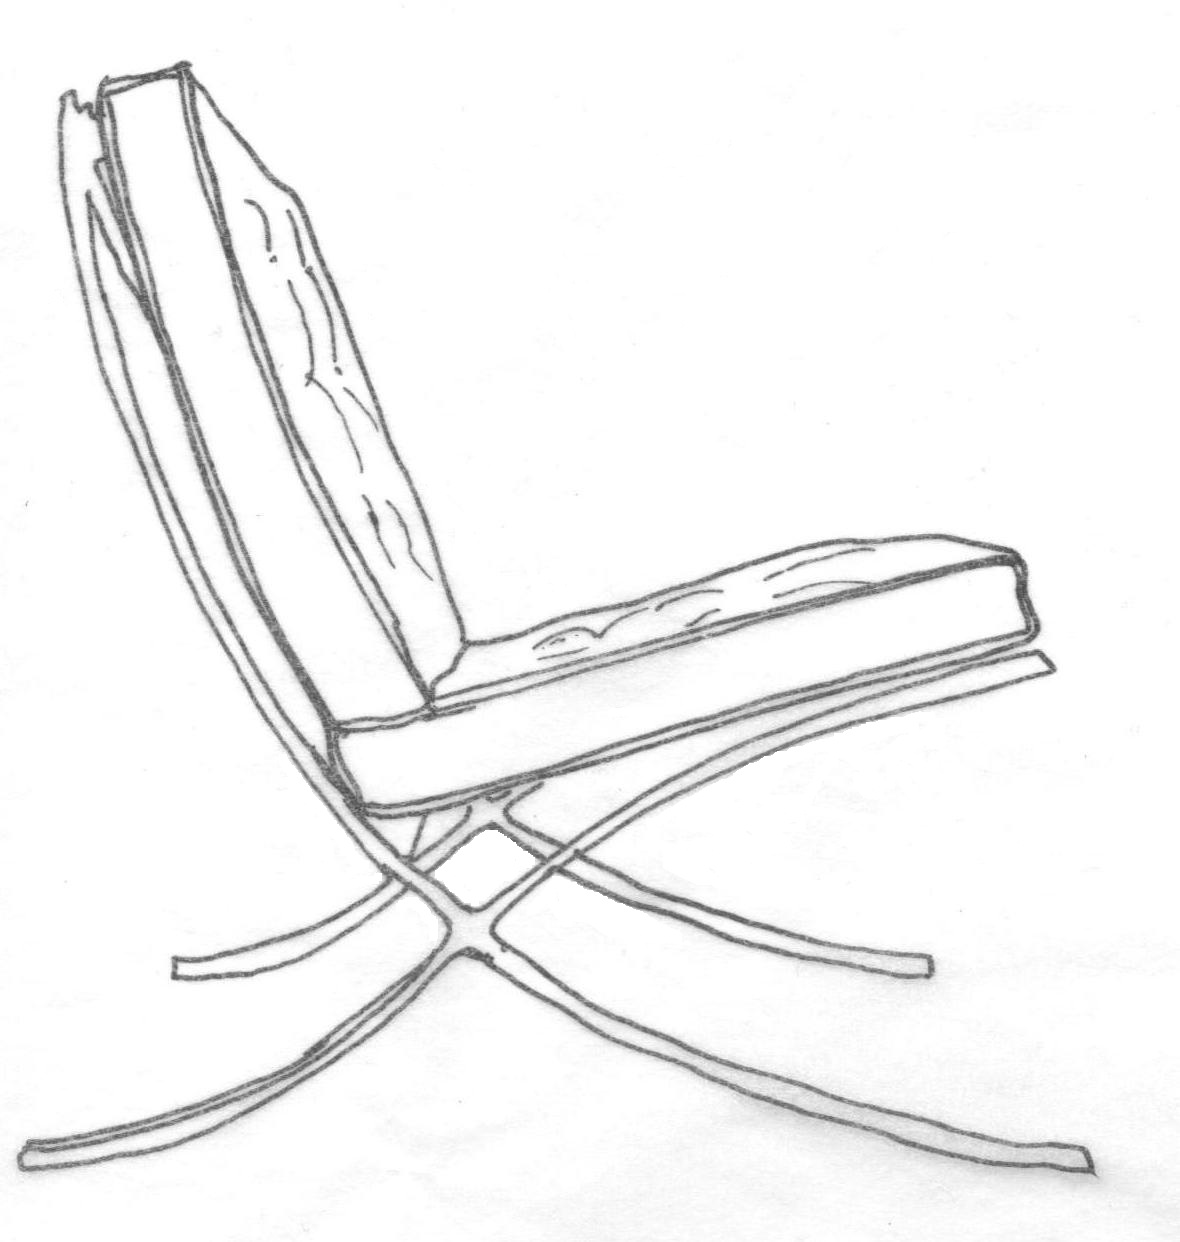 Furniture Amp Architecture Sketchbook By Kristina Romero At